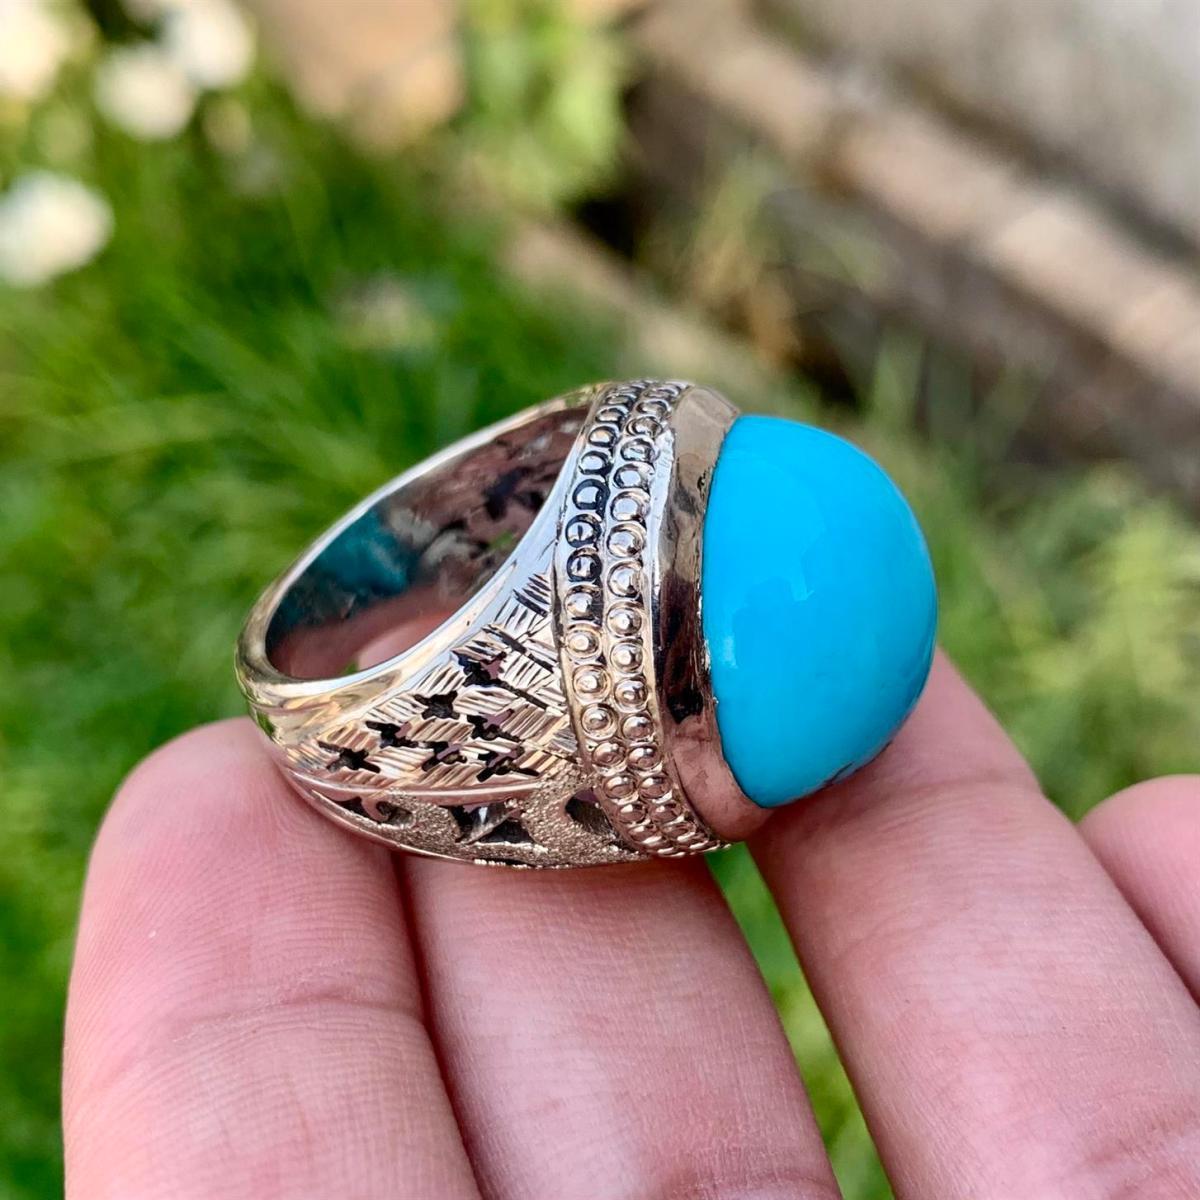 Beautiful Big Nishapuri Feroza Blue Turquoise Round Ring online in Pakistan 6 natural gemstones pakistan + 925 silver jewelry online